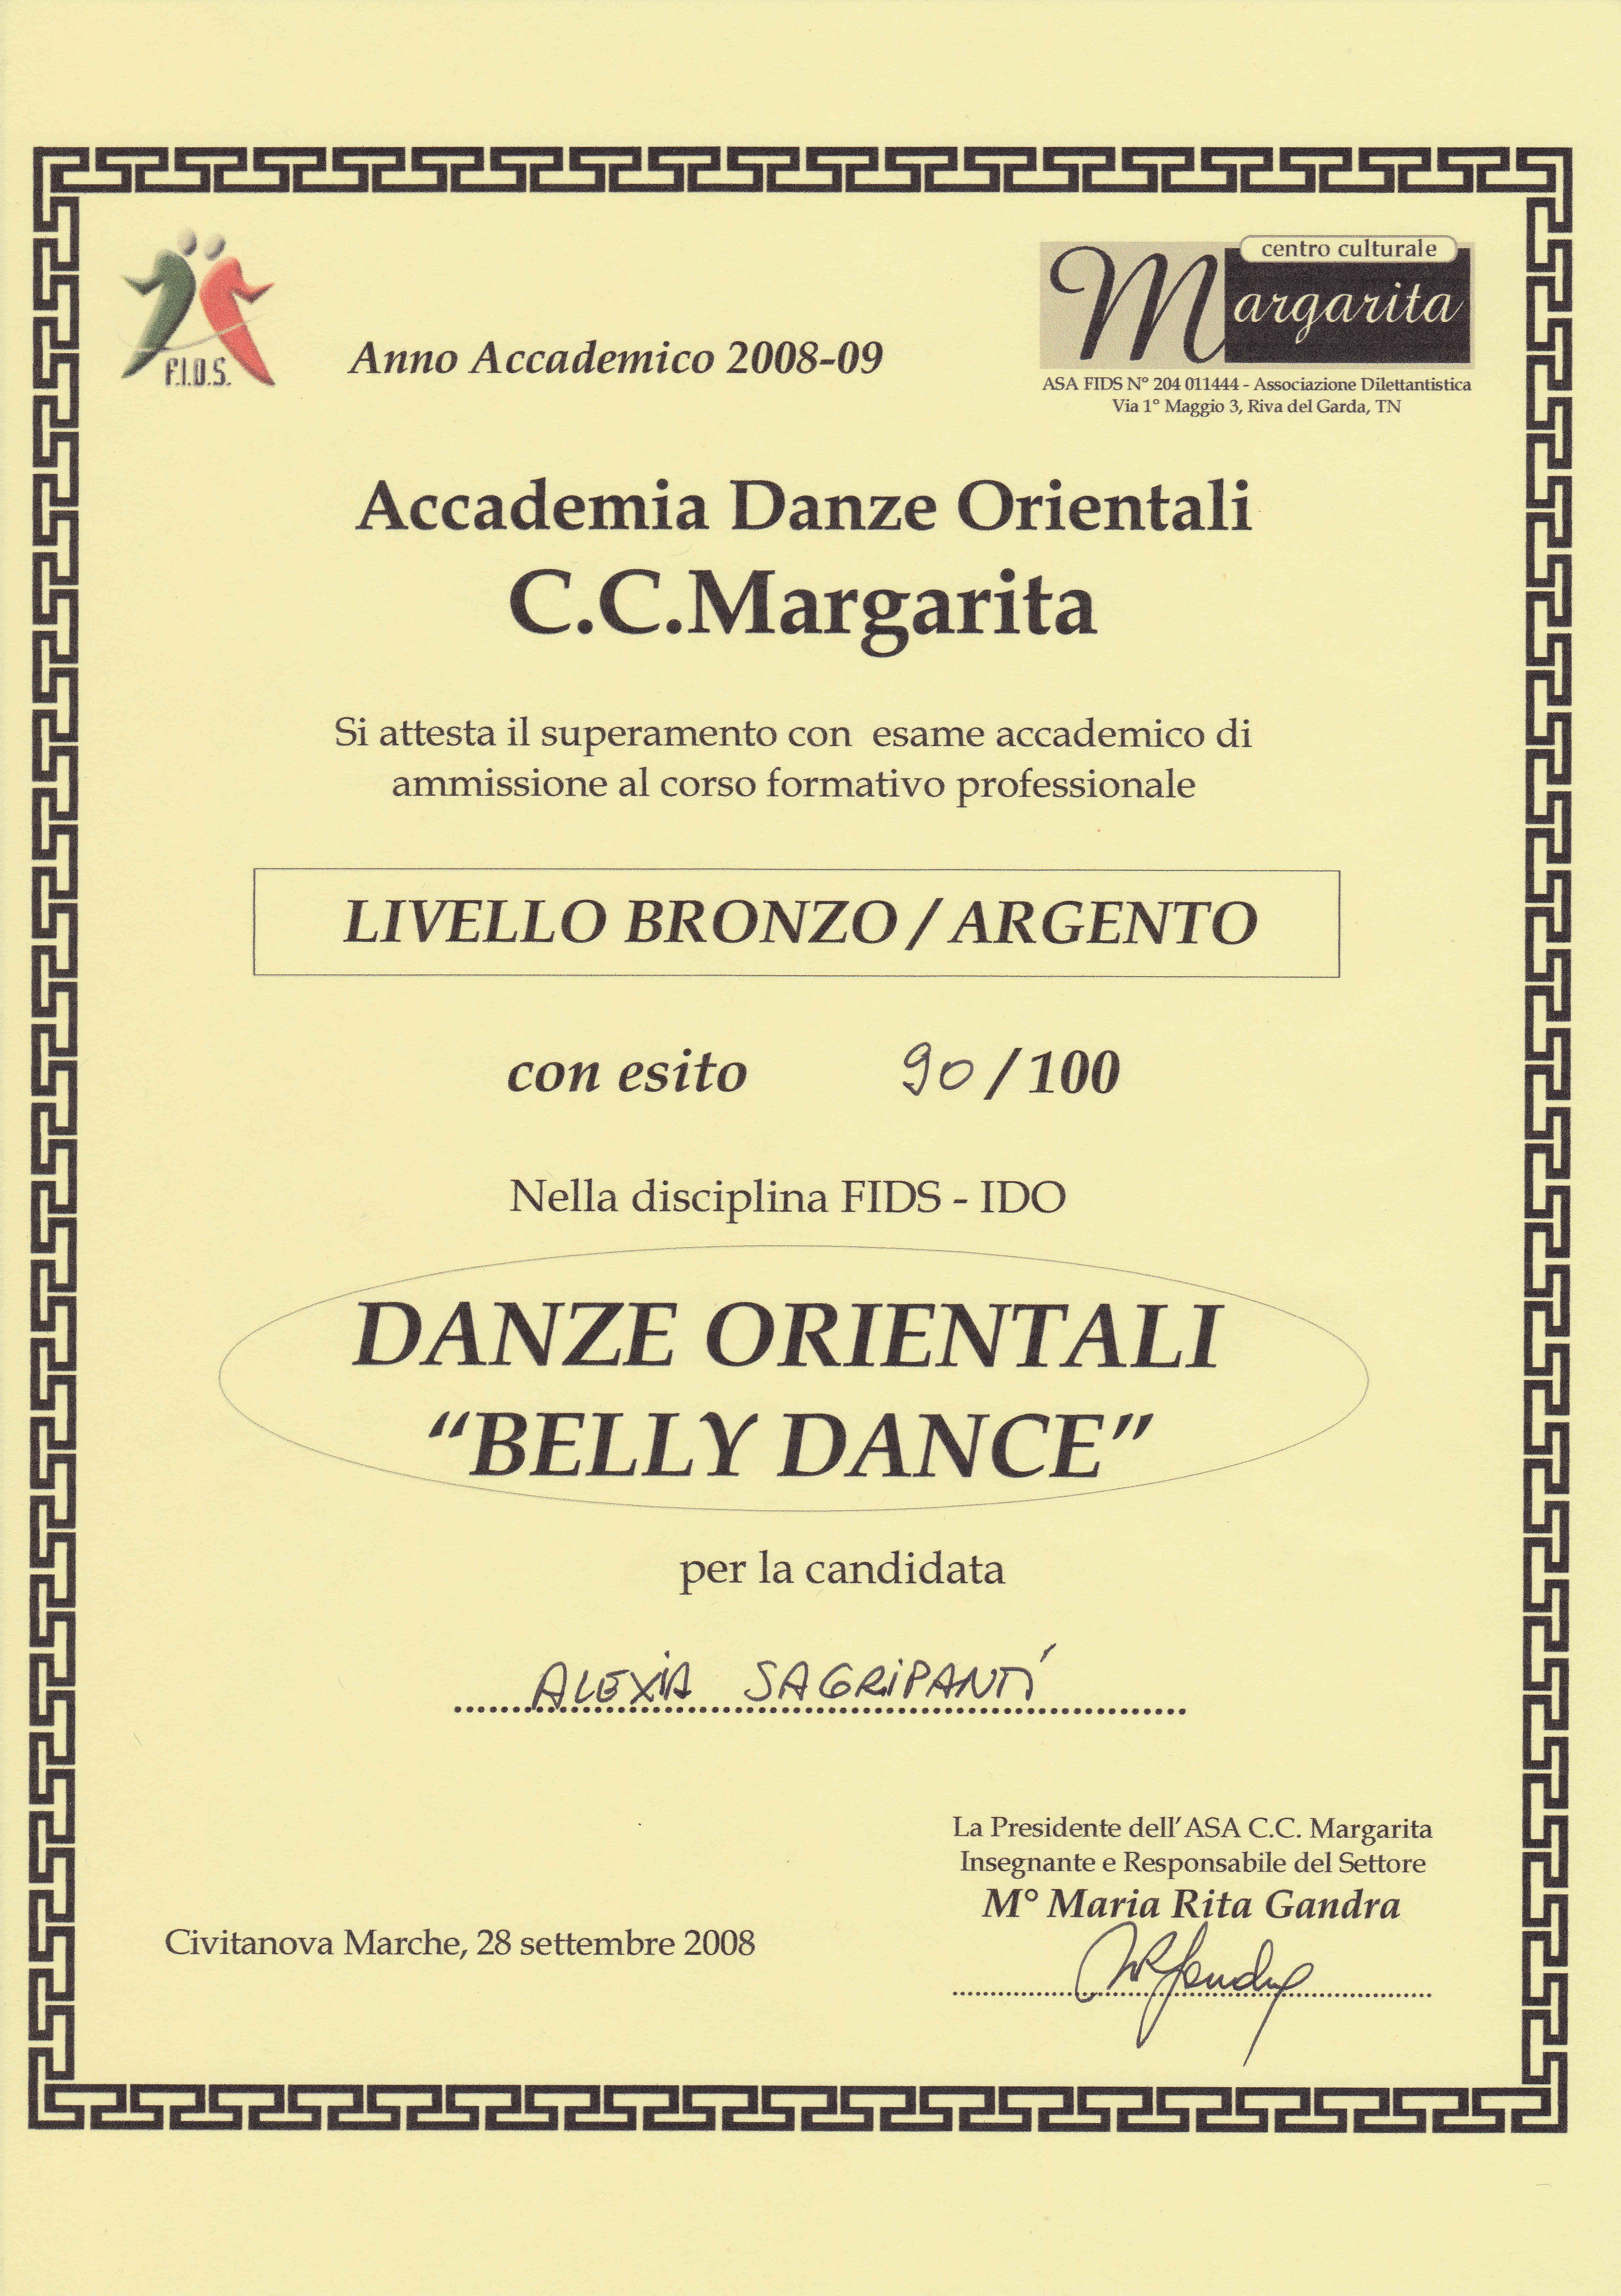 2008 - Verona